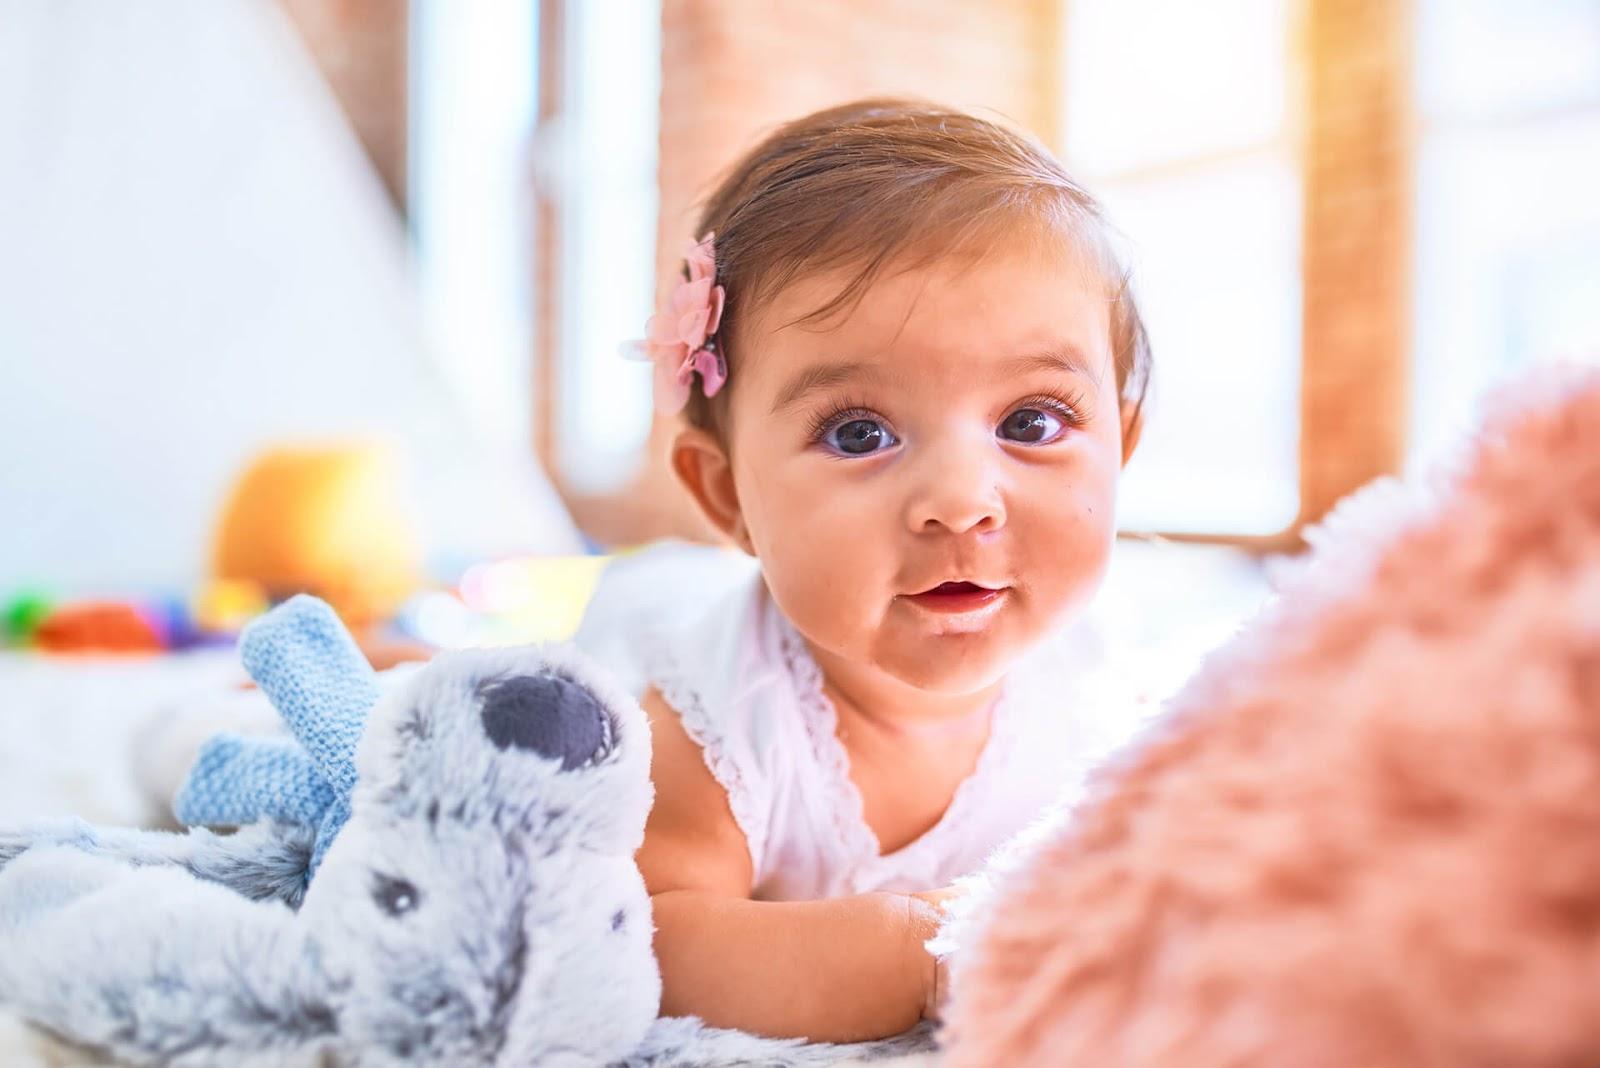 Brown eyed baby girl looking at the camera